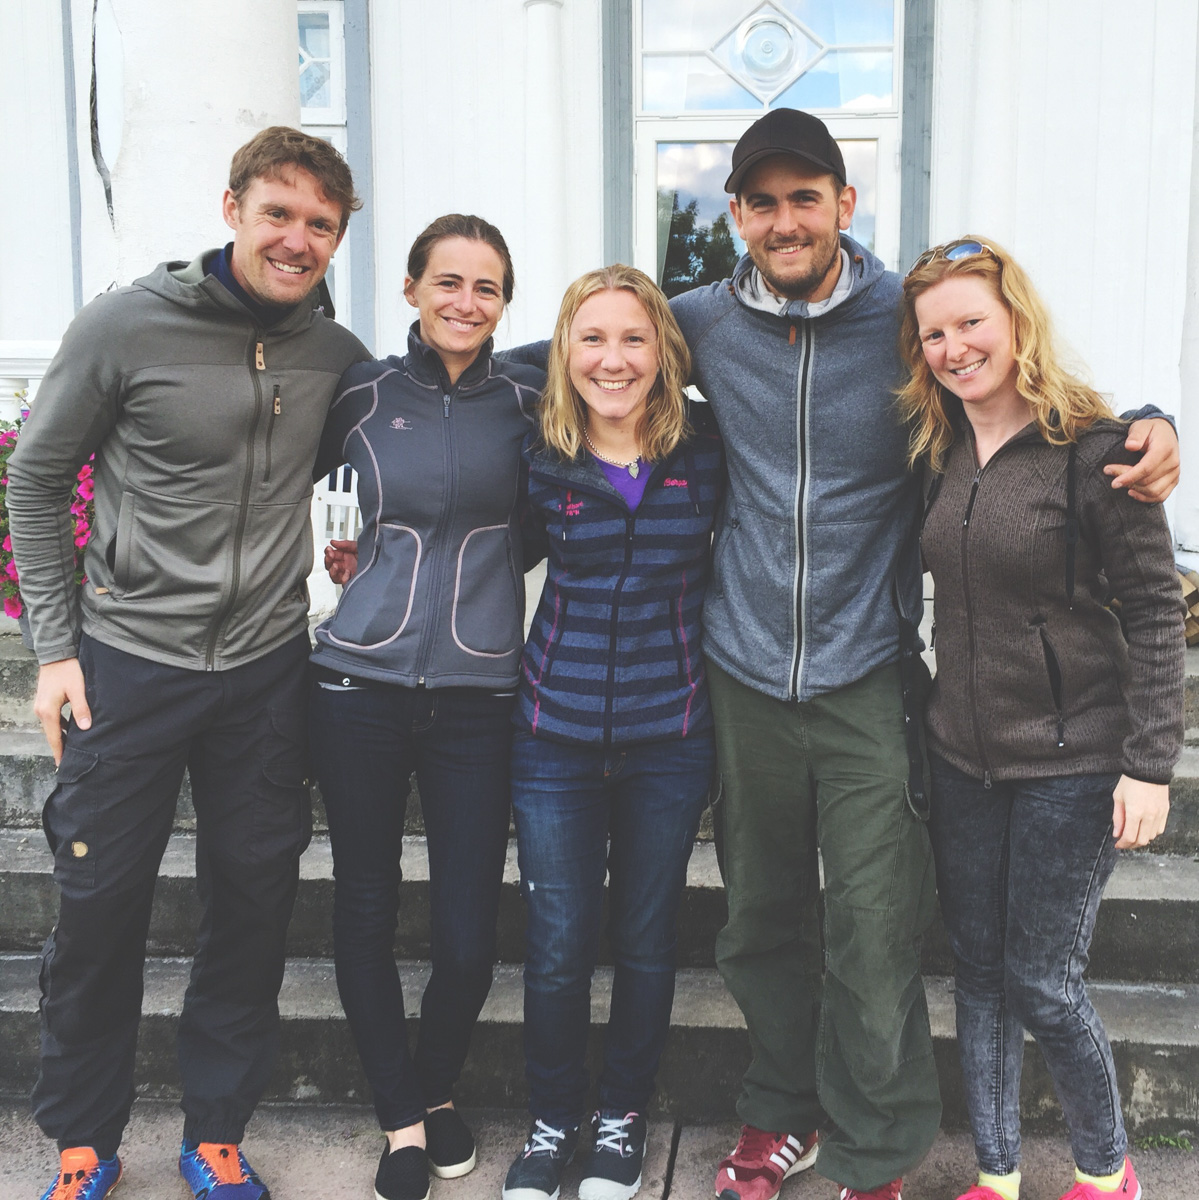 Me, Elin, Kjersti, Matias, & Anne. Happy to be back at Hurdal Verk!